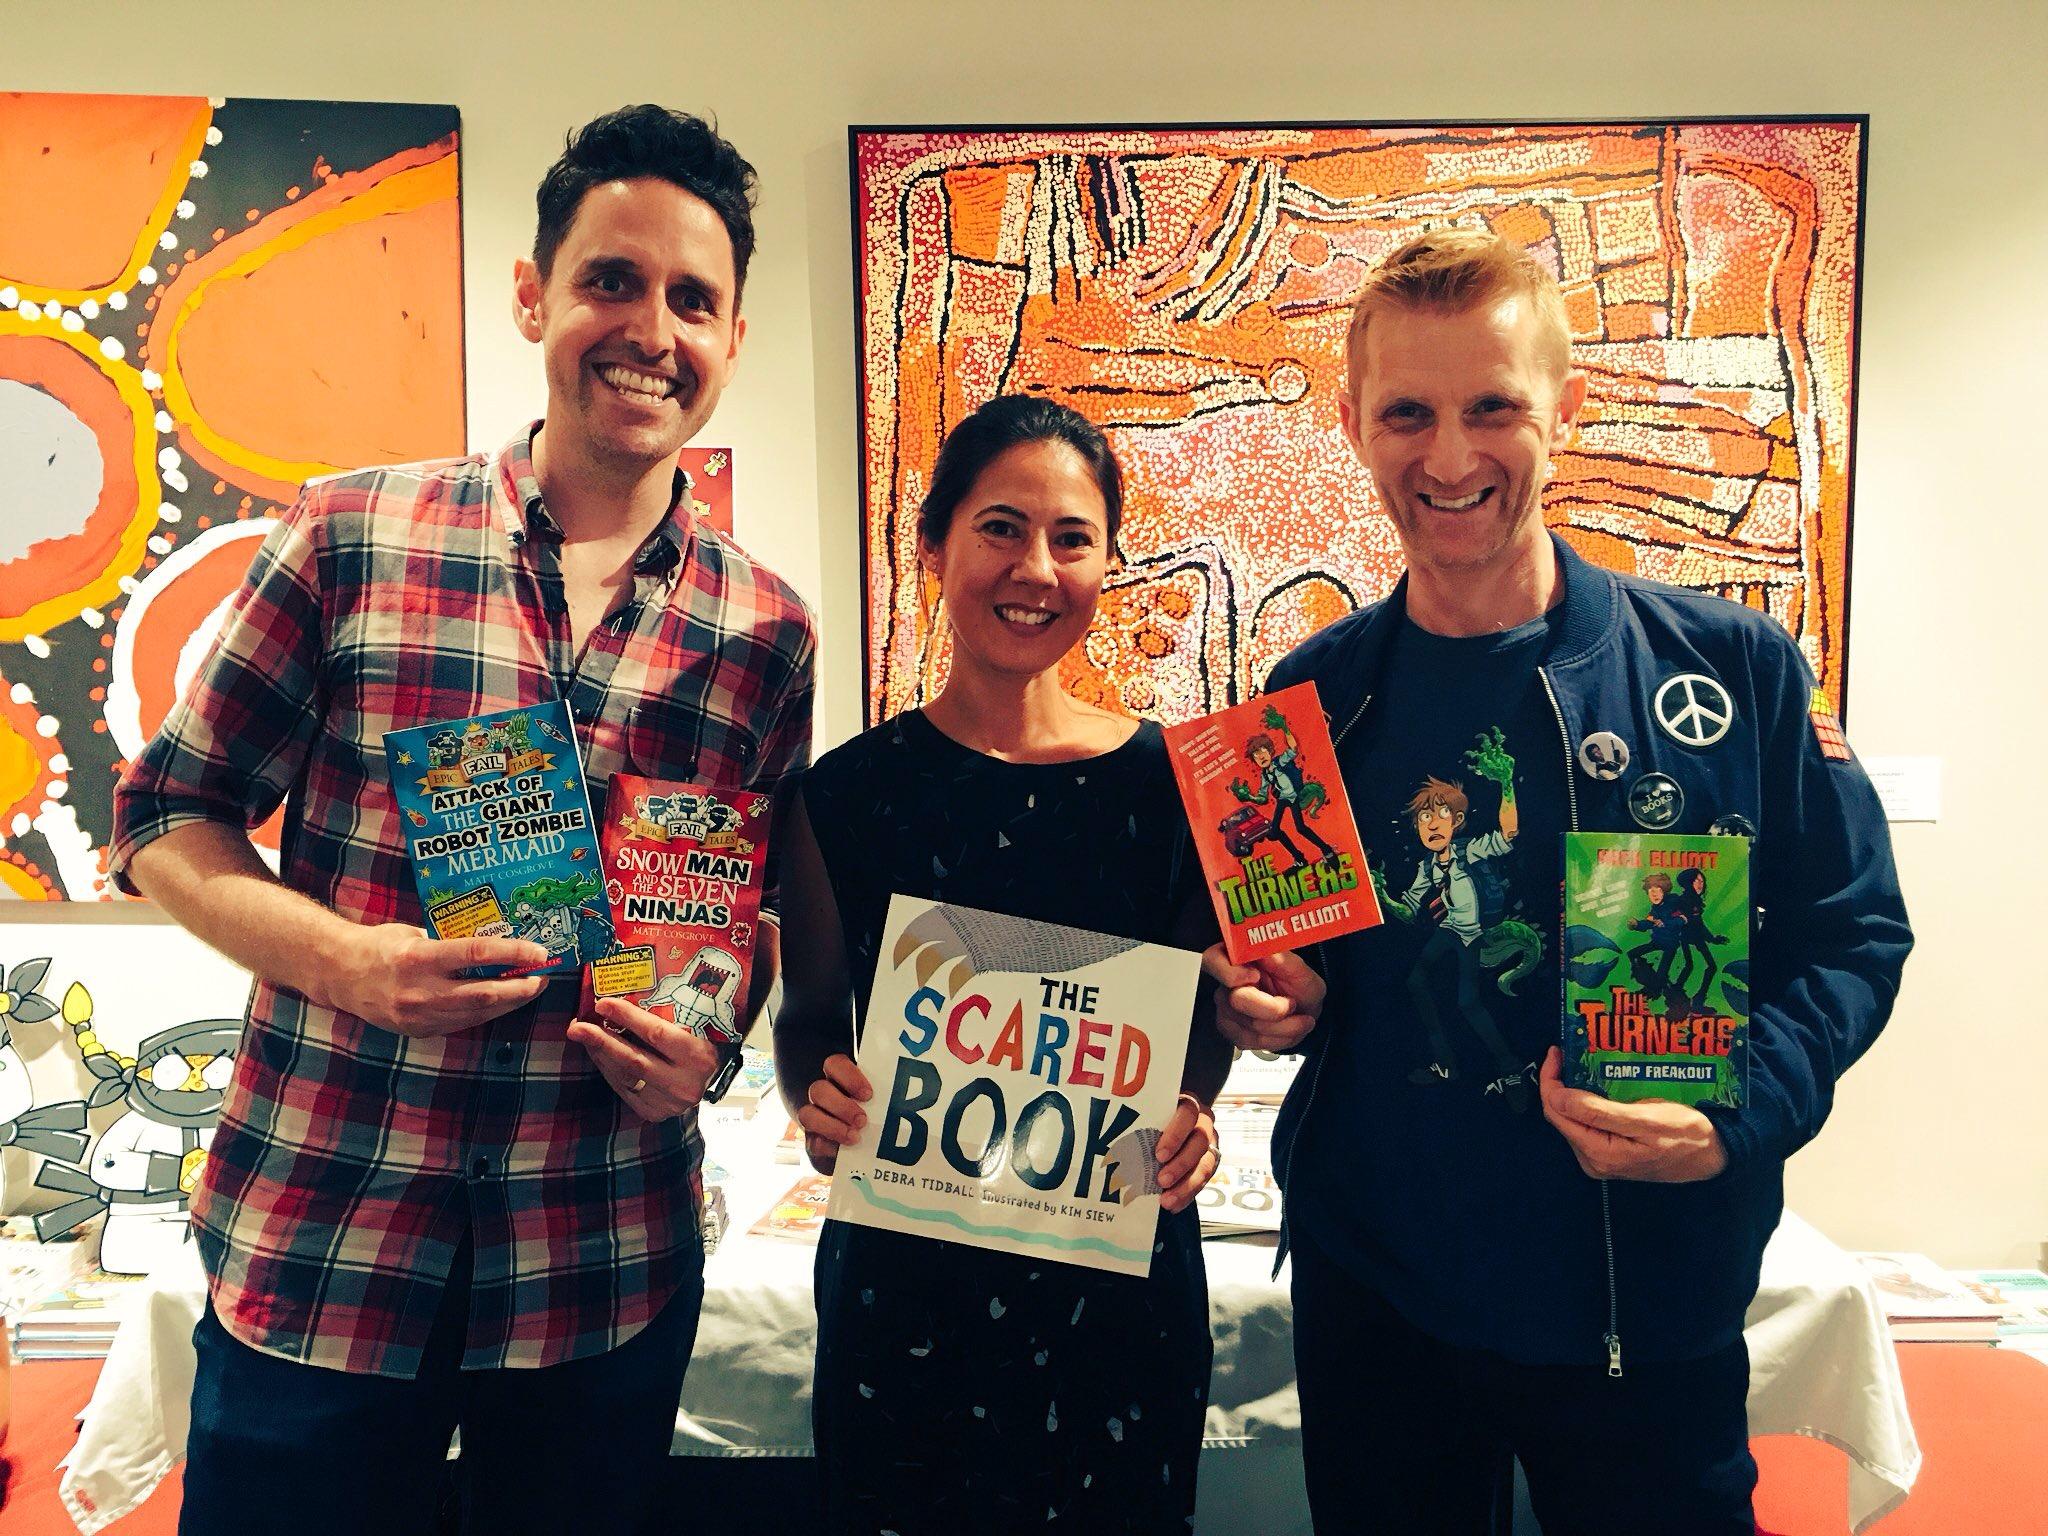 Matt Cosgrove, Kim Siew and Mick Elliott at Better Read Than Dead in Newtown